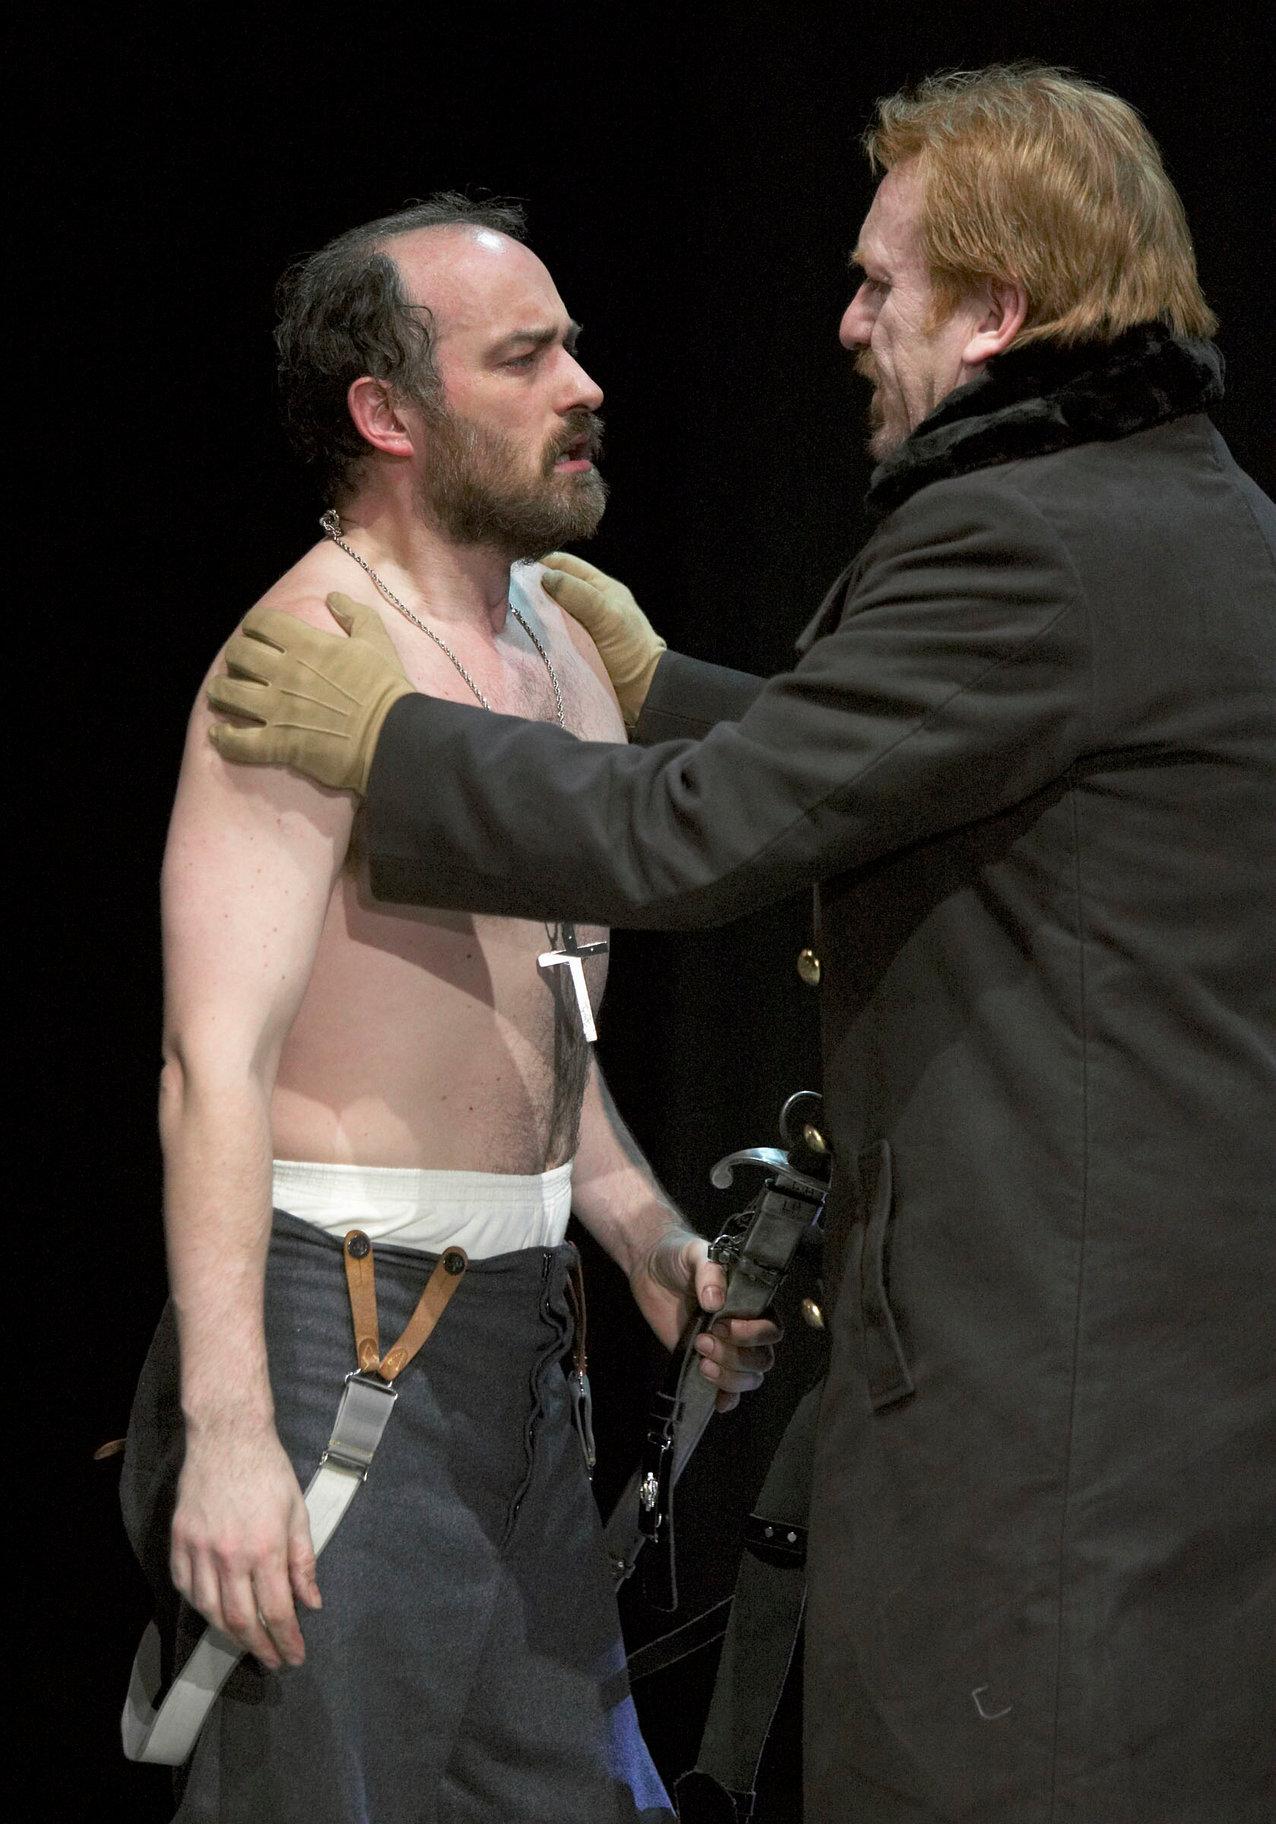 Banquo and Macduff.